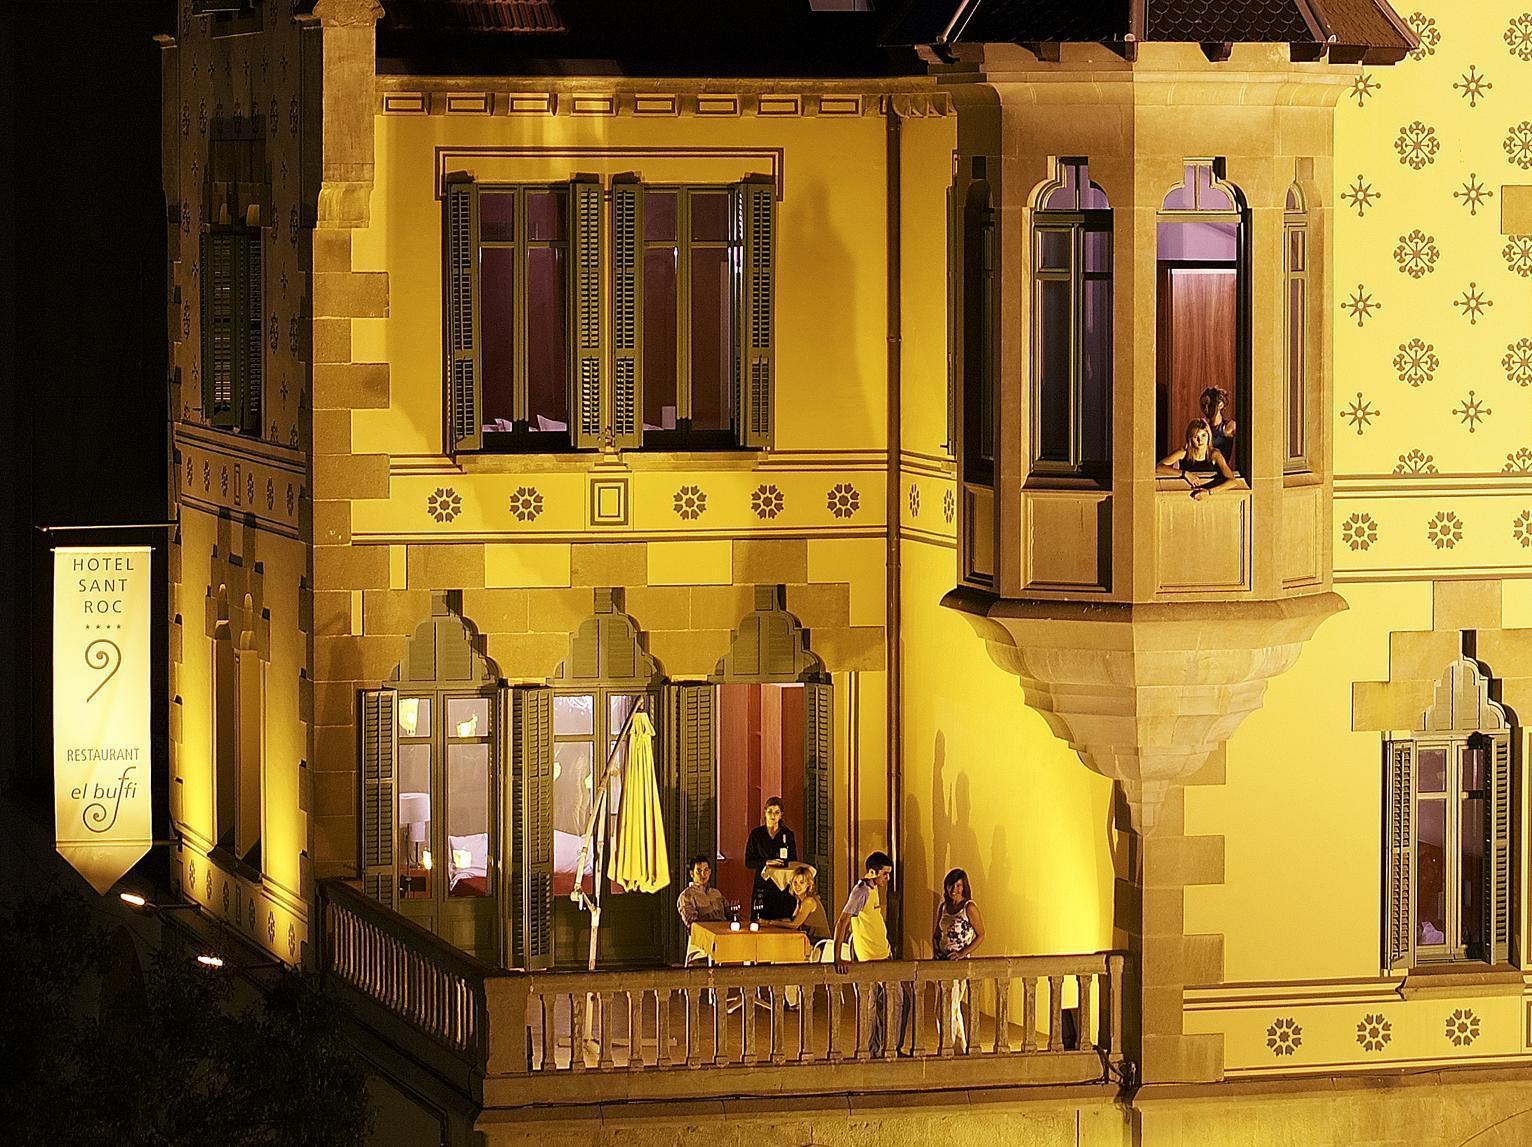 Rusticae Hotel Sant Roc Solsona - Exterior